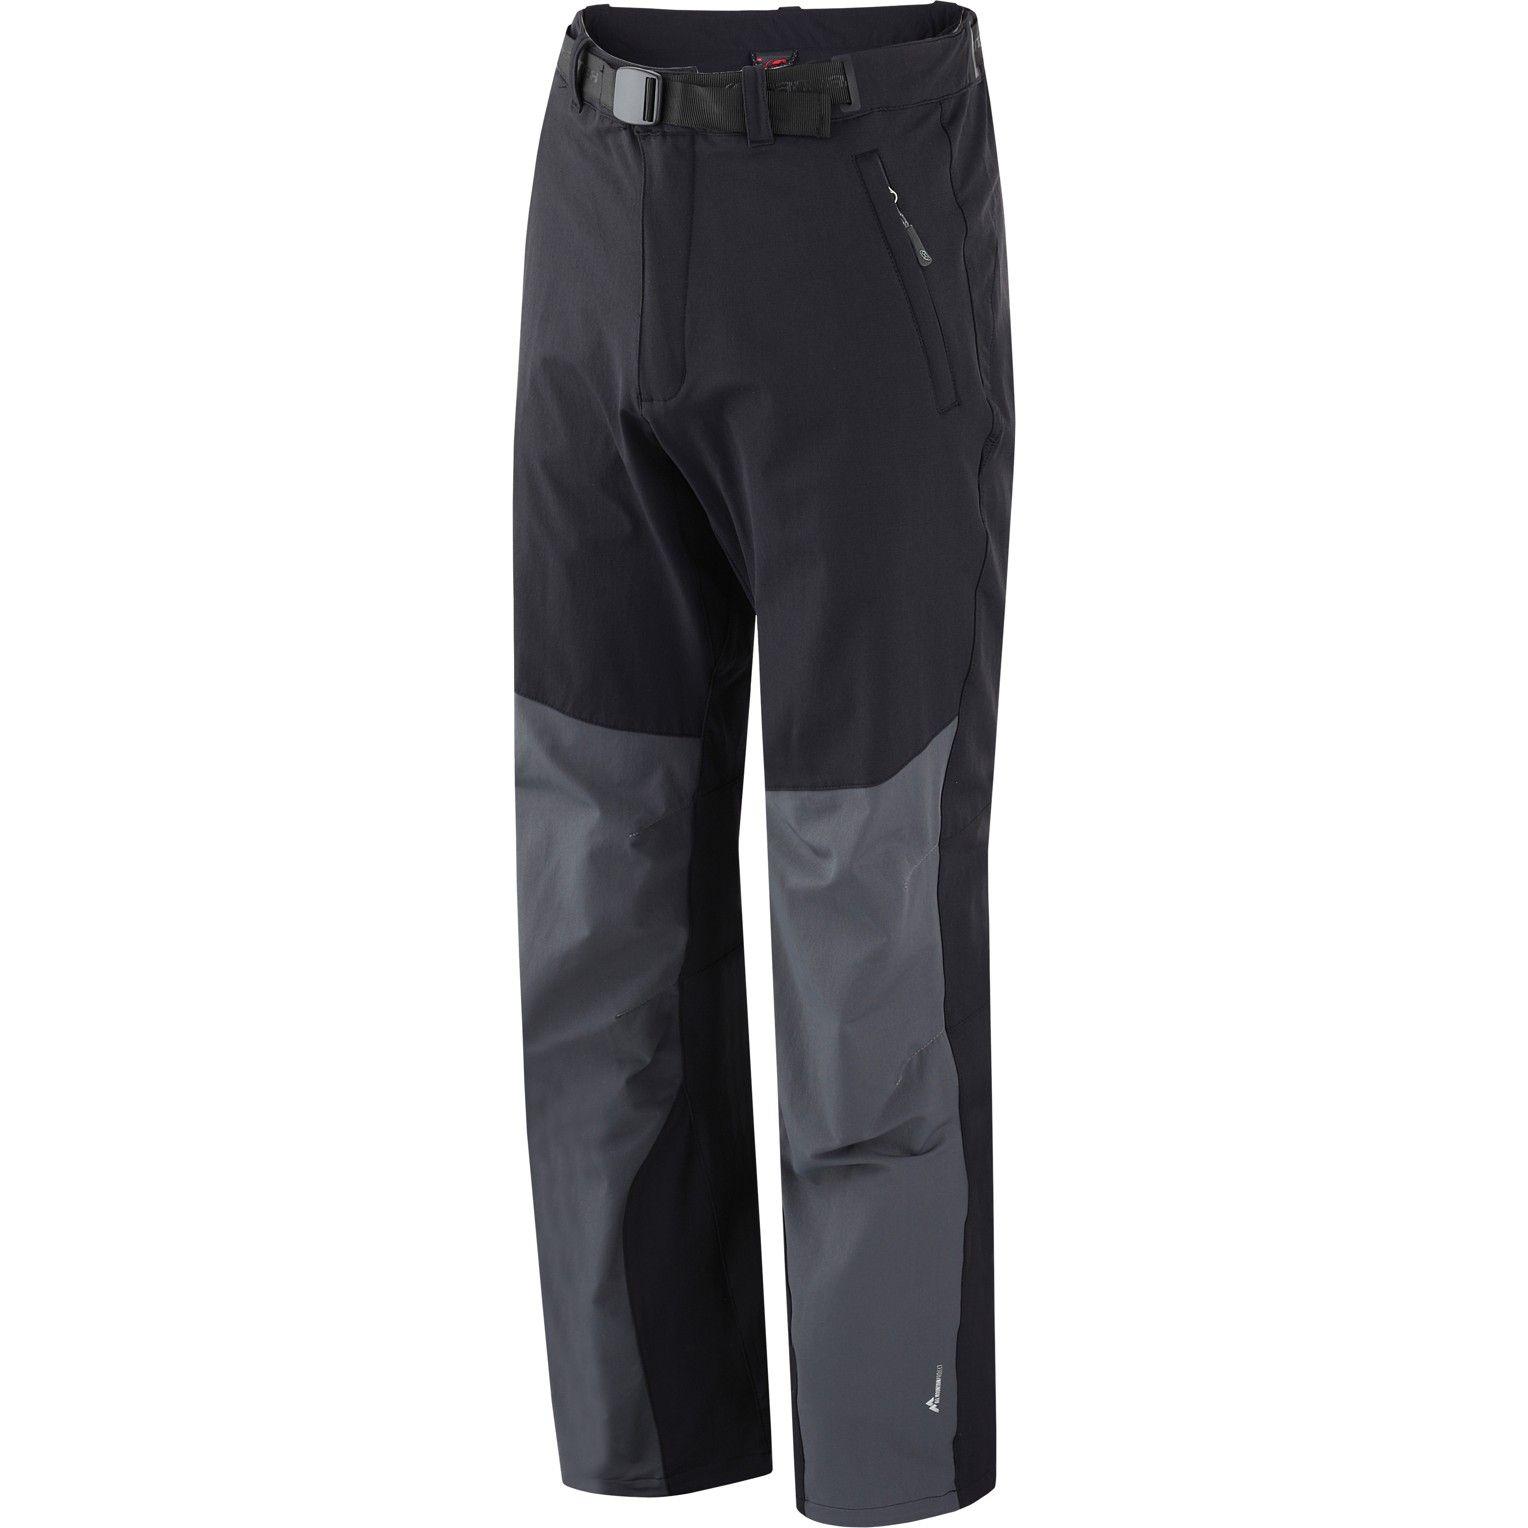 Pantaloni barbati Hannah Enduro Antracit/Gri imagine